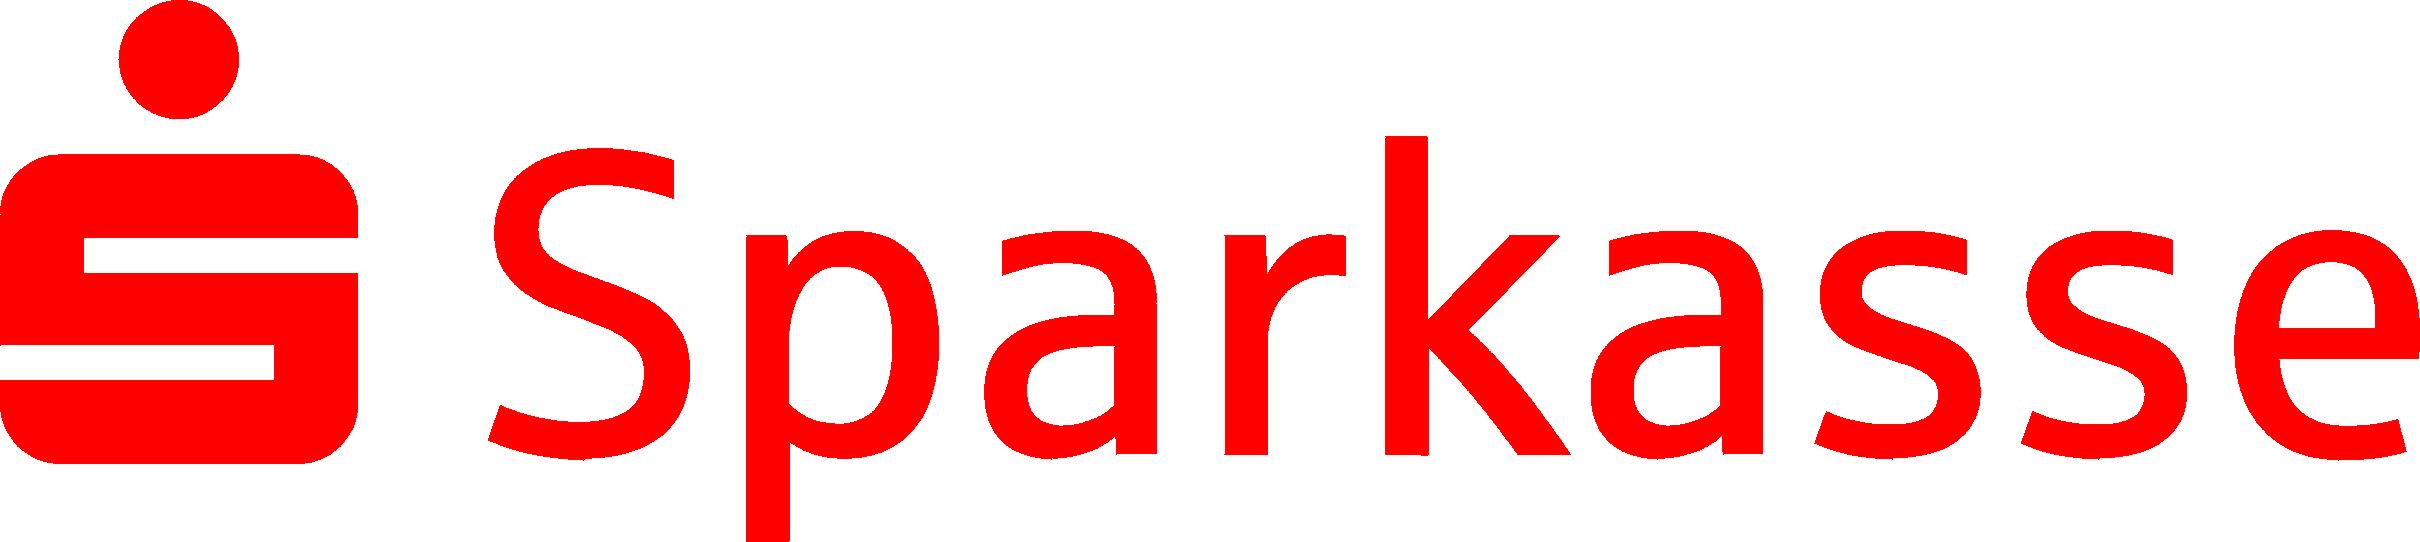 Logo Sparkasse.jpg